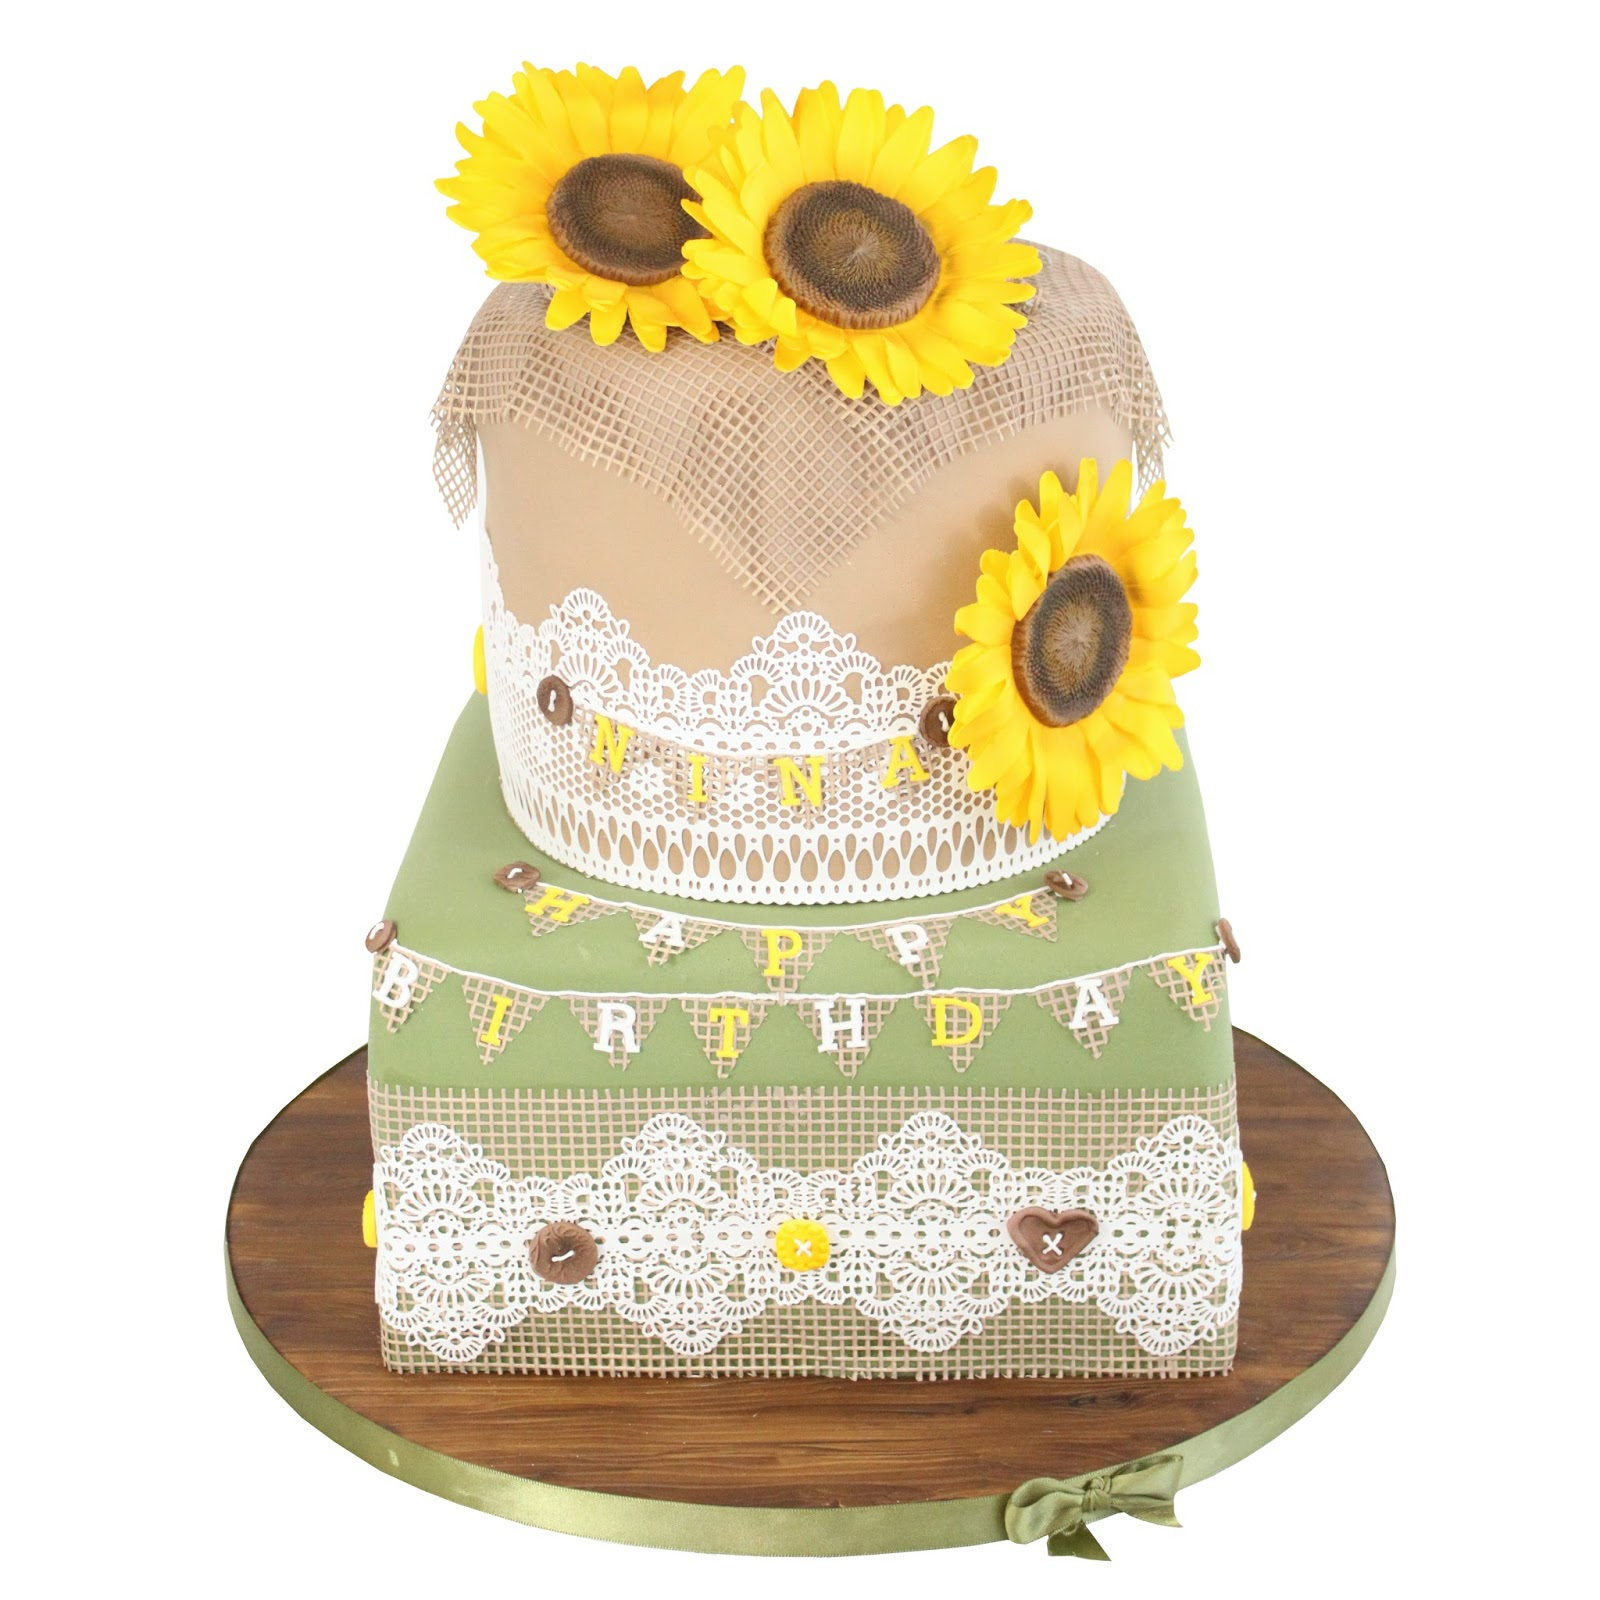 Almond Art: Sunflowers, Hessian & Vintage Lace Cake